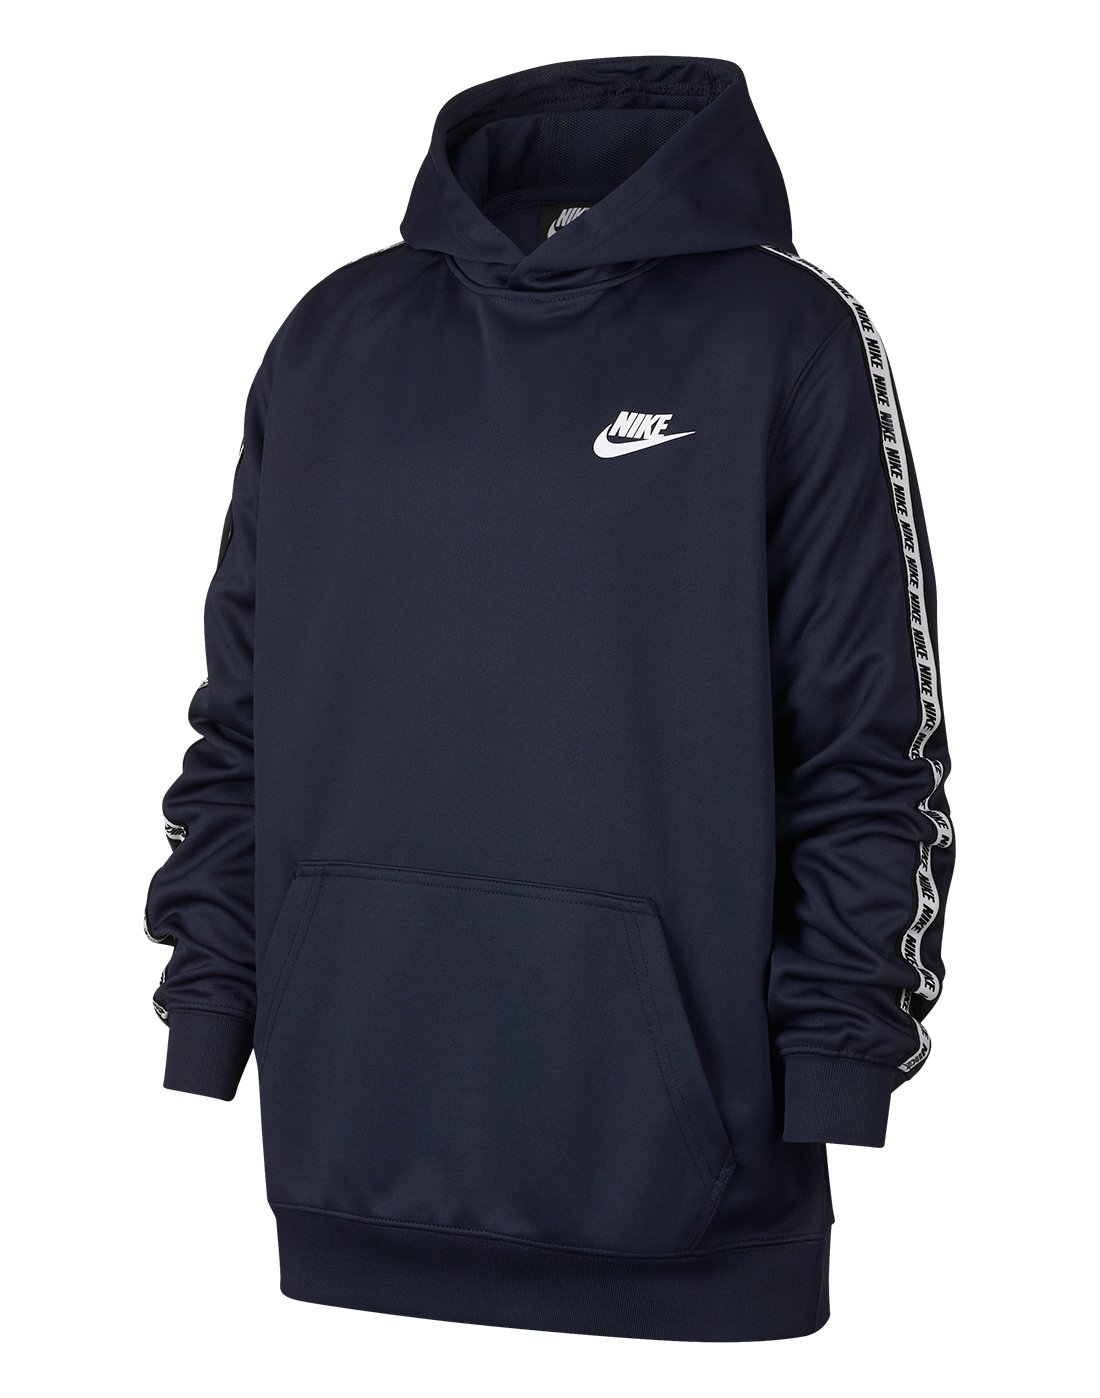 6a92158d0af7 Boy s Navy Nike Logo Tape Hoodie